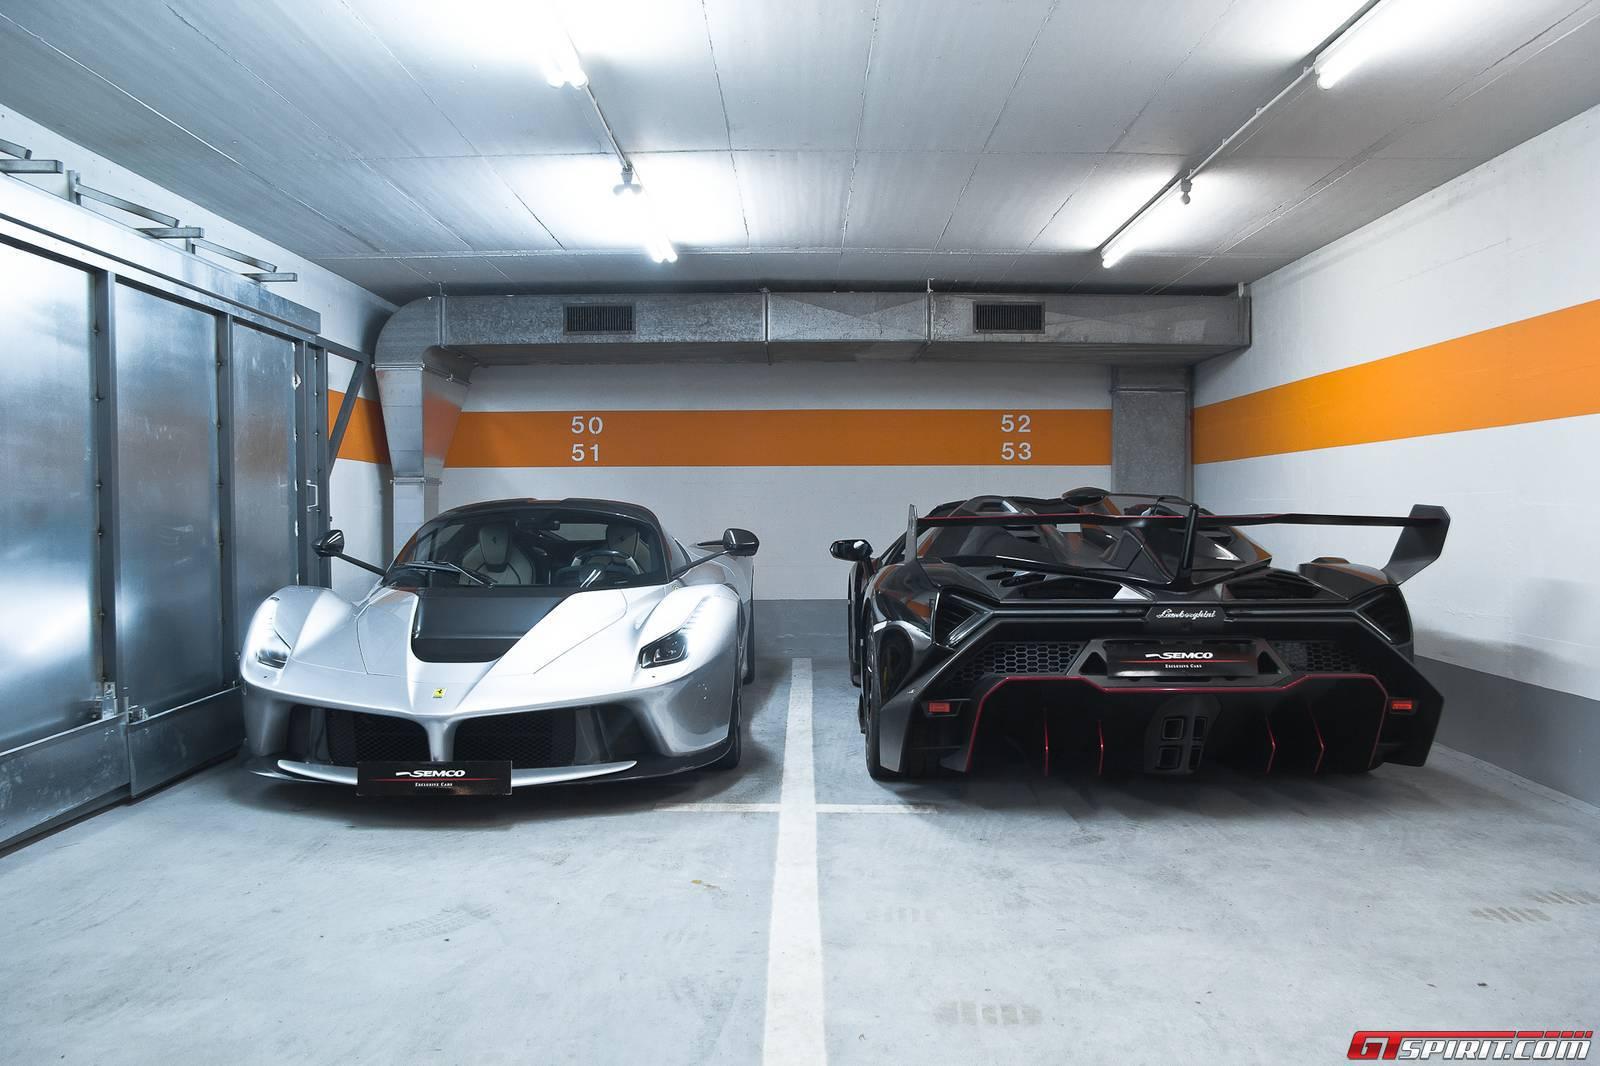 Exclusive: LaFerrari and Lamborghini Veneno Photoshoot! - GTspirit on la ferrari vs corvette, la ferrari vs koenigsegg, la ferrari vs bugatti, la ferrari vs mustang,